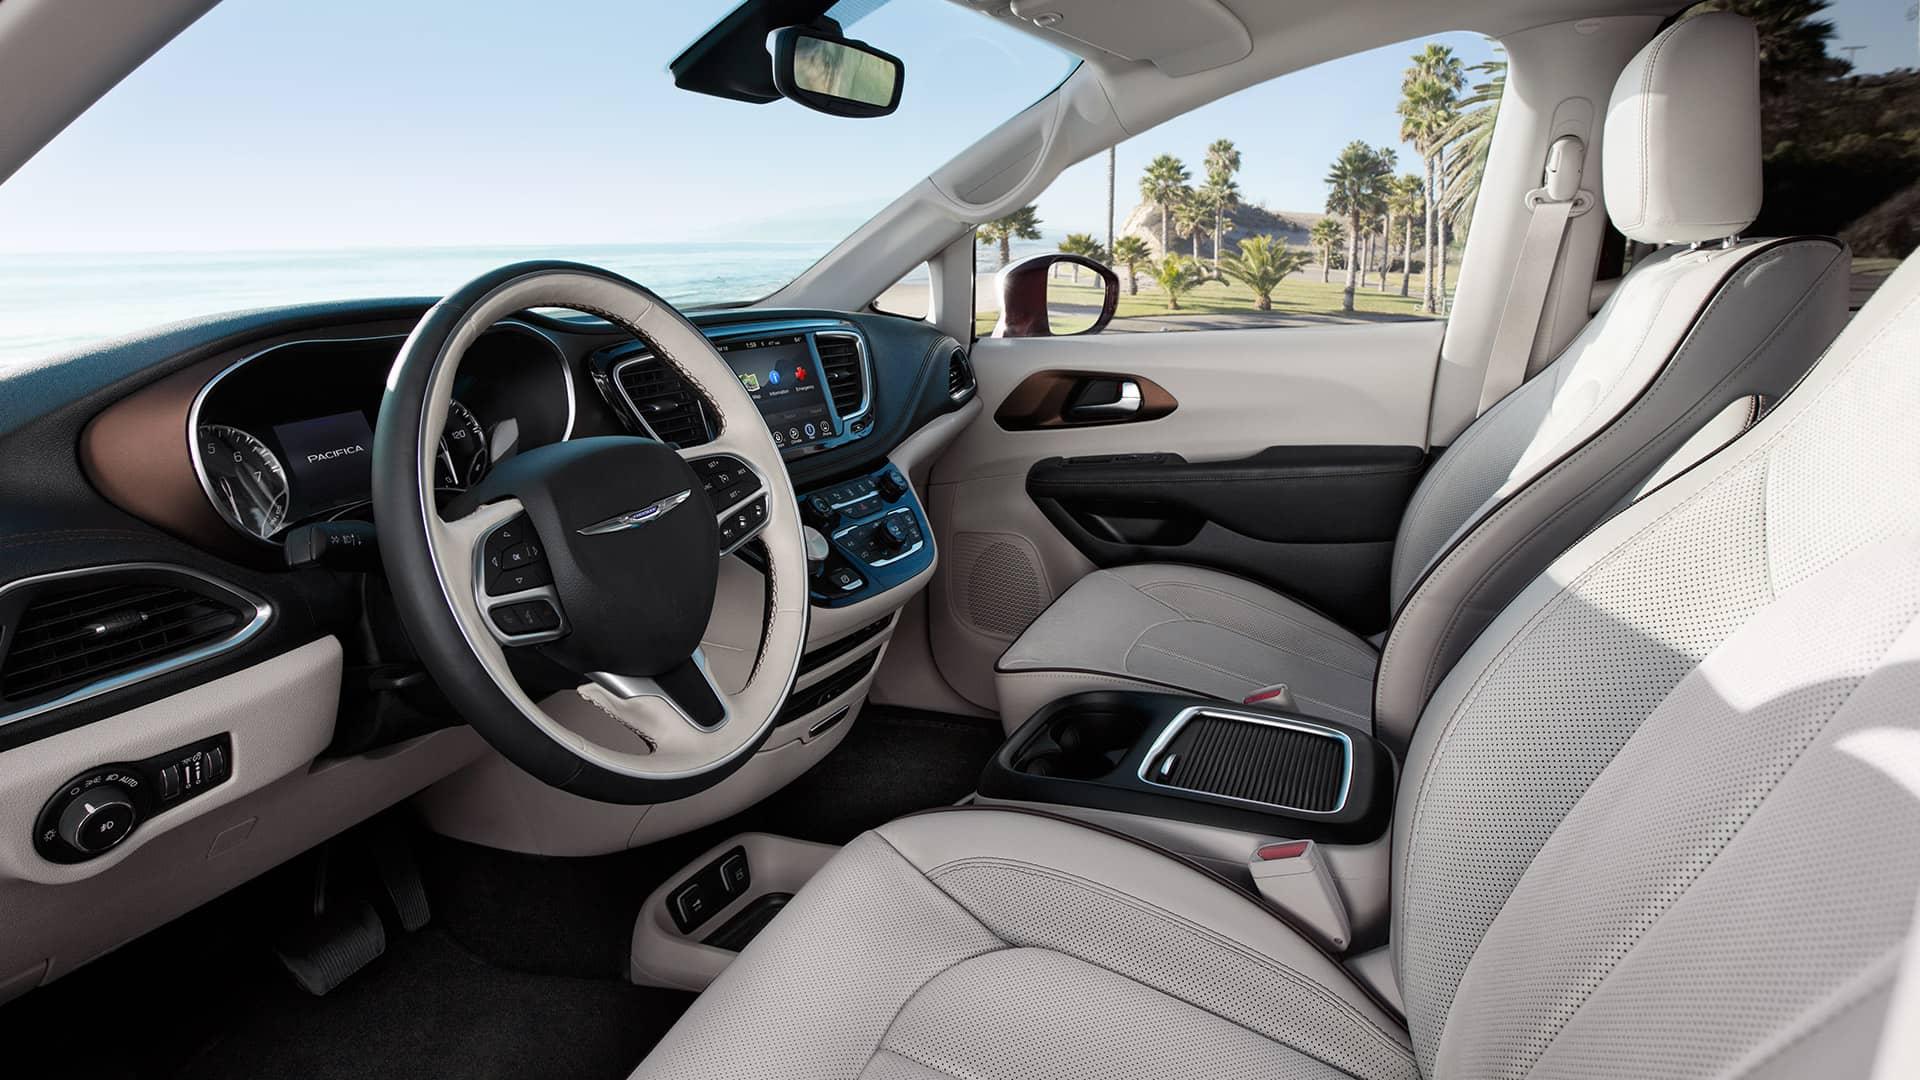 Chrysler Pacifica Minivan Artioli Chrysler Dodge Ram - Chrysler incentives assistance center